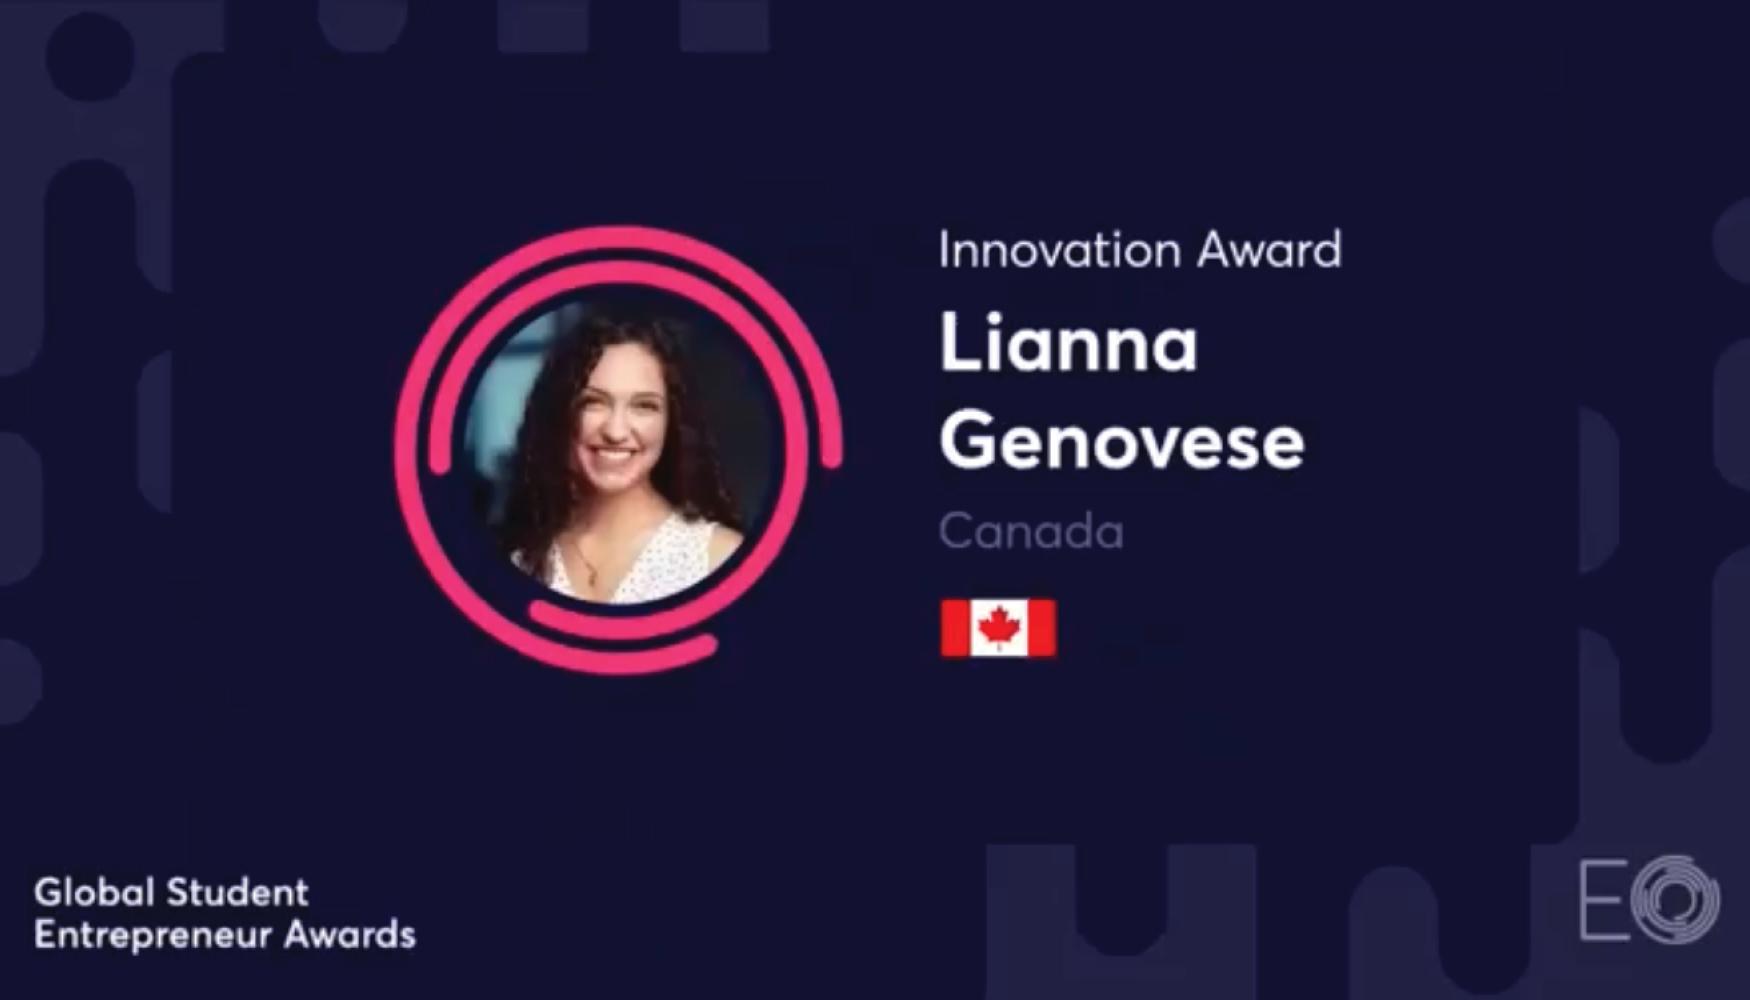 The Clinic @ Mac resident Lianna Genovese won the Innovation Award at the 2021 Global Student Entrepreneur Awards